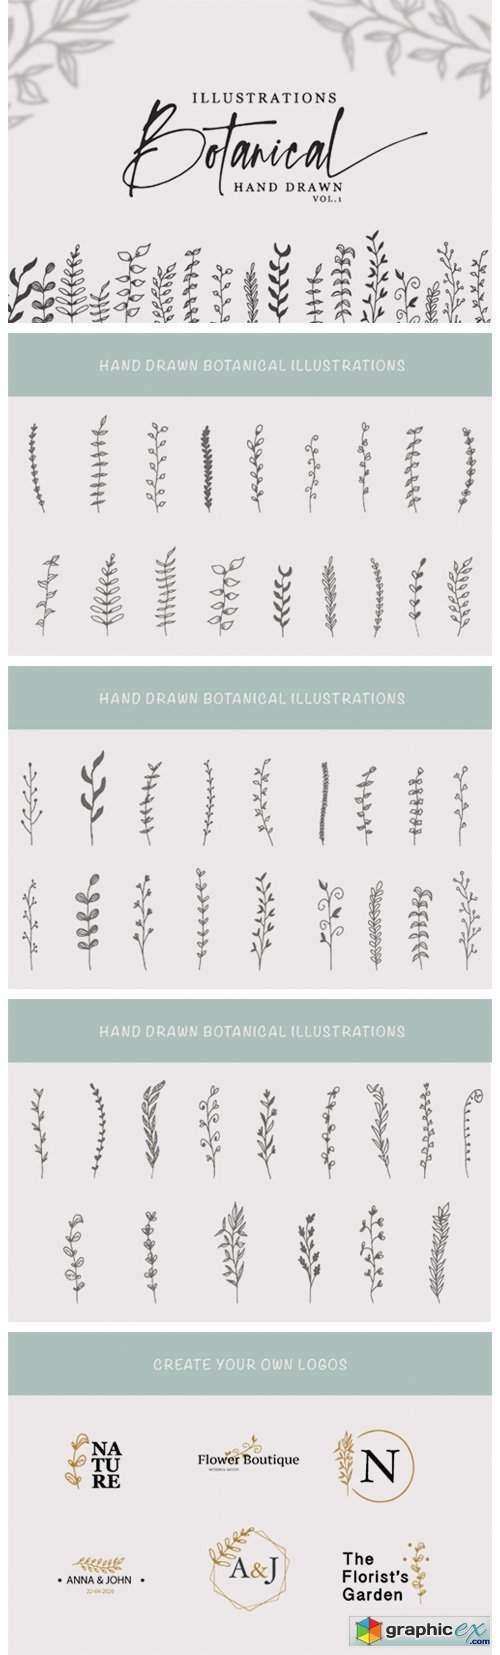 Hand Drawn Botanical Illustrations Vol.1